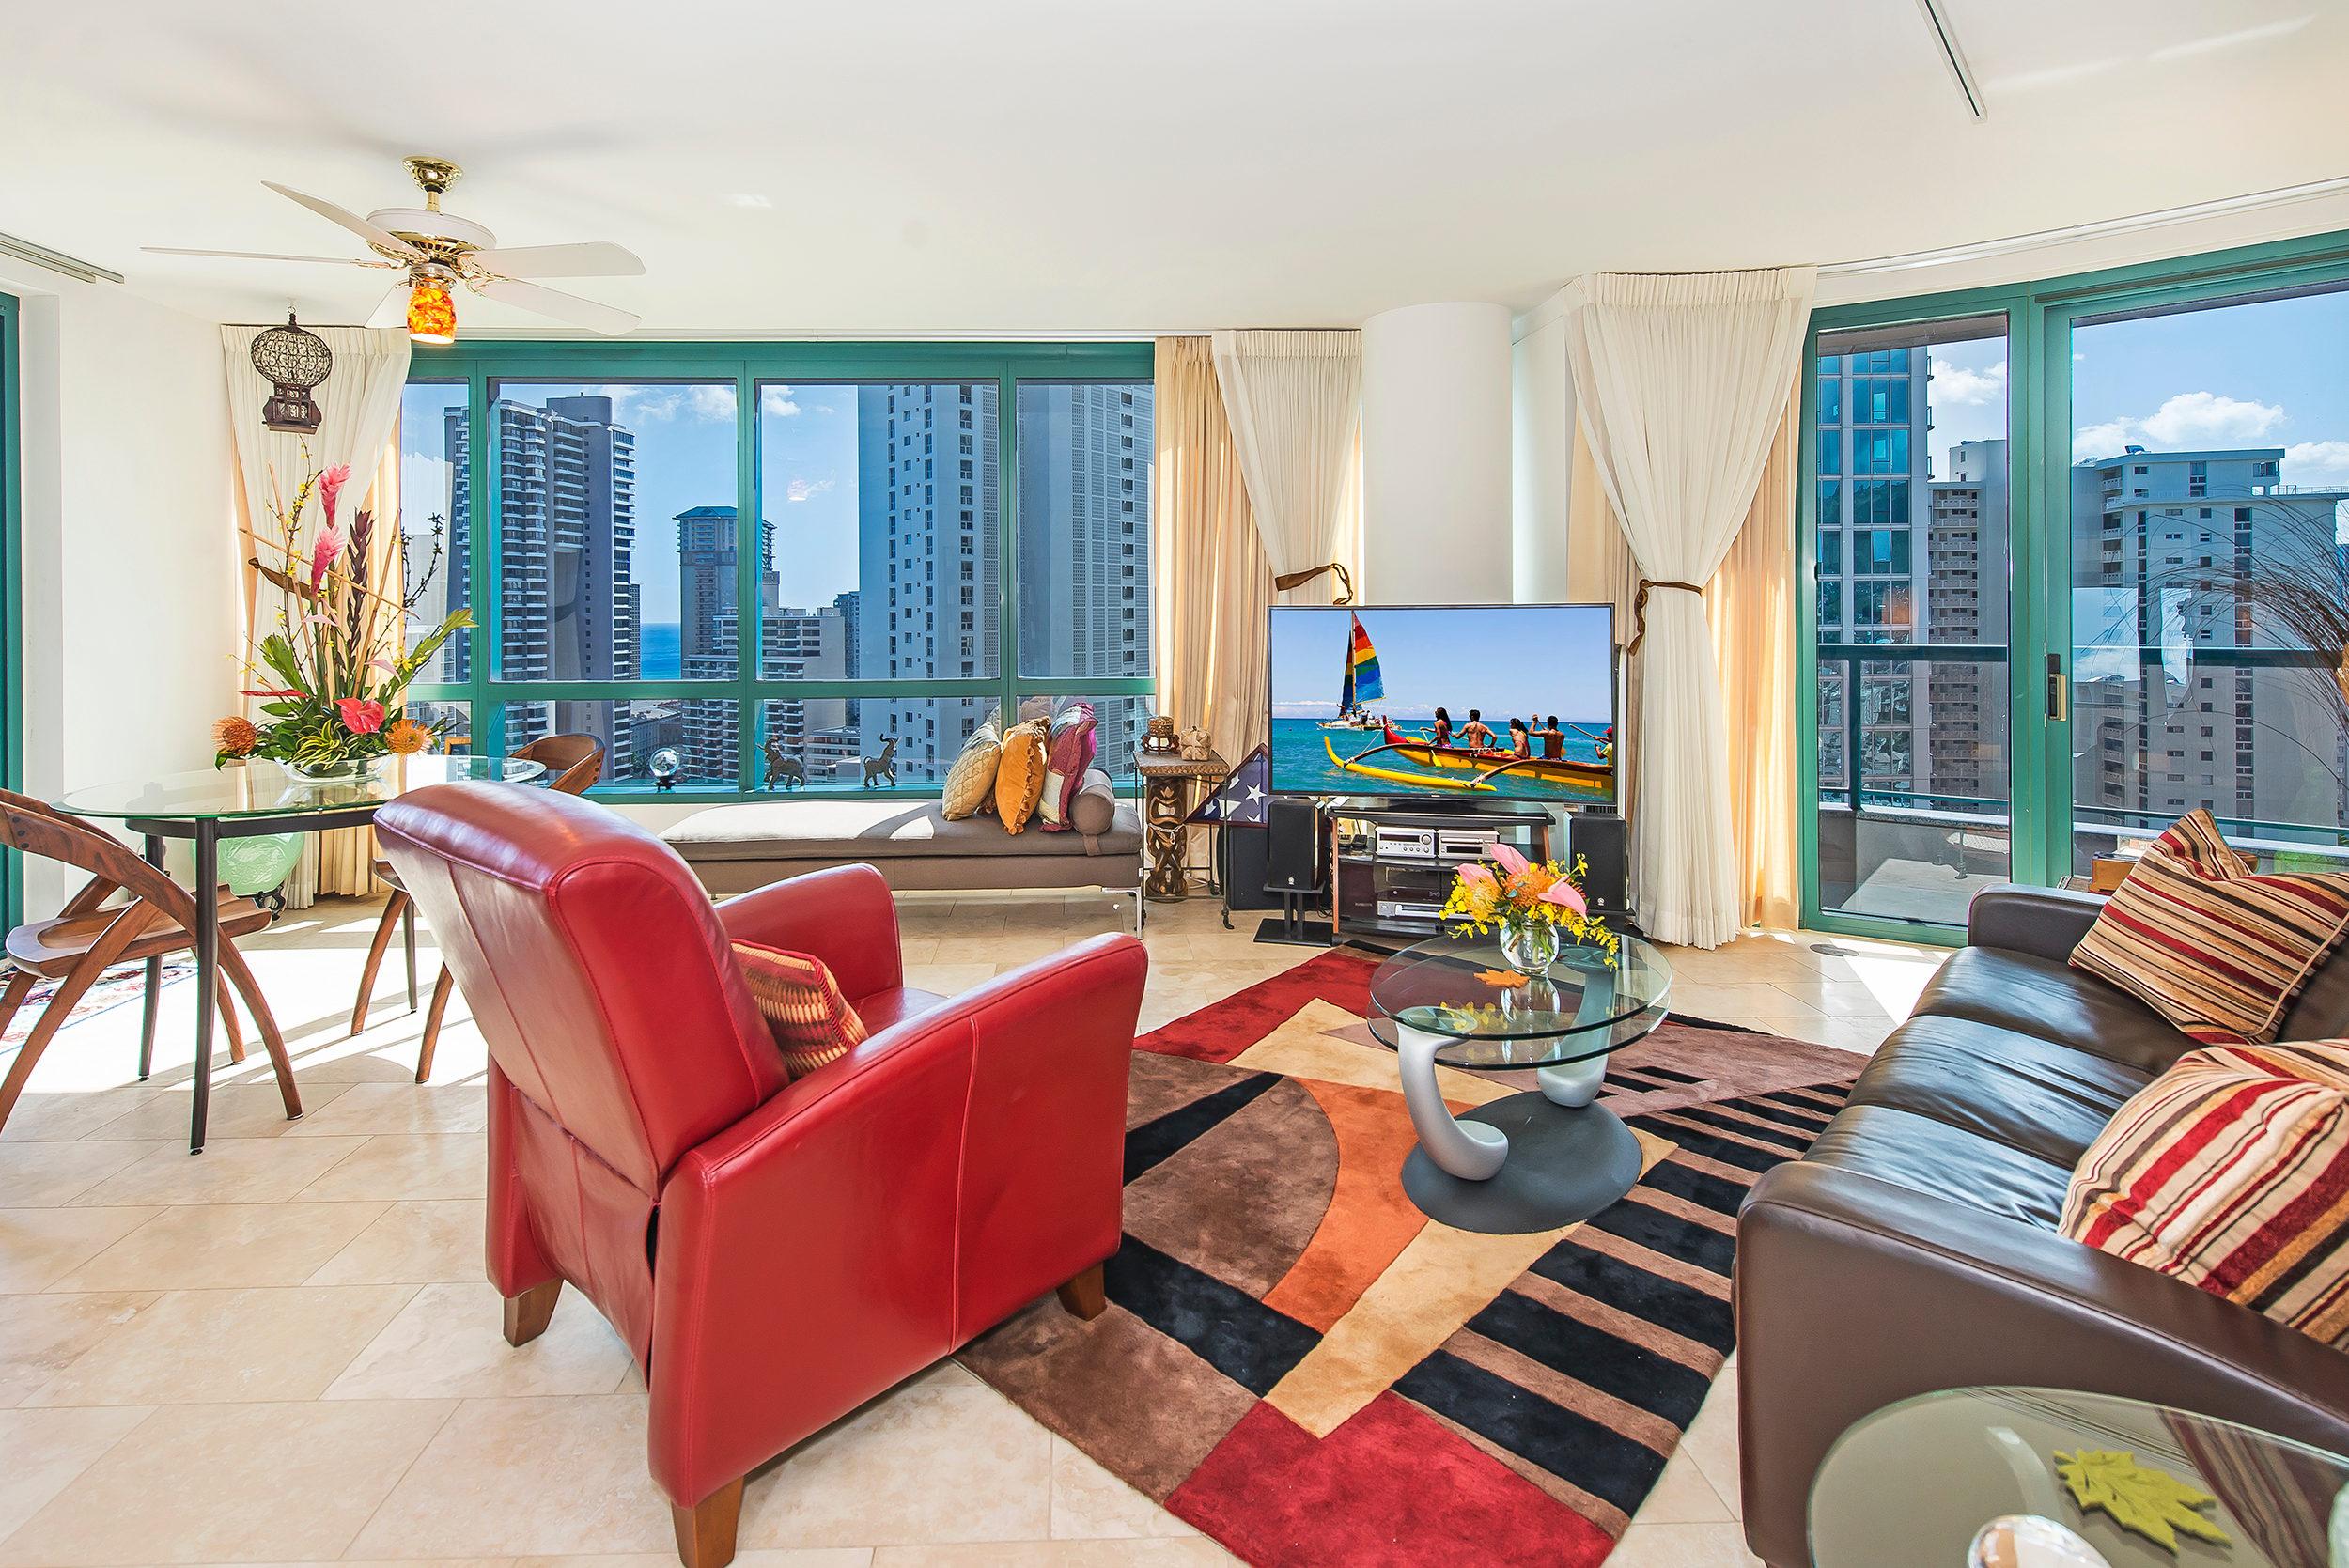 Condominium for Sale at Premier Waikiki Condominium 1888 Kalakaua Ave #2704 Waikiki, Honolulu, Hawaii 96815 United States